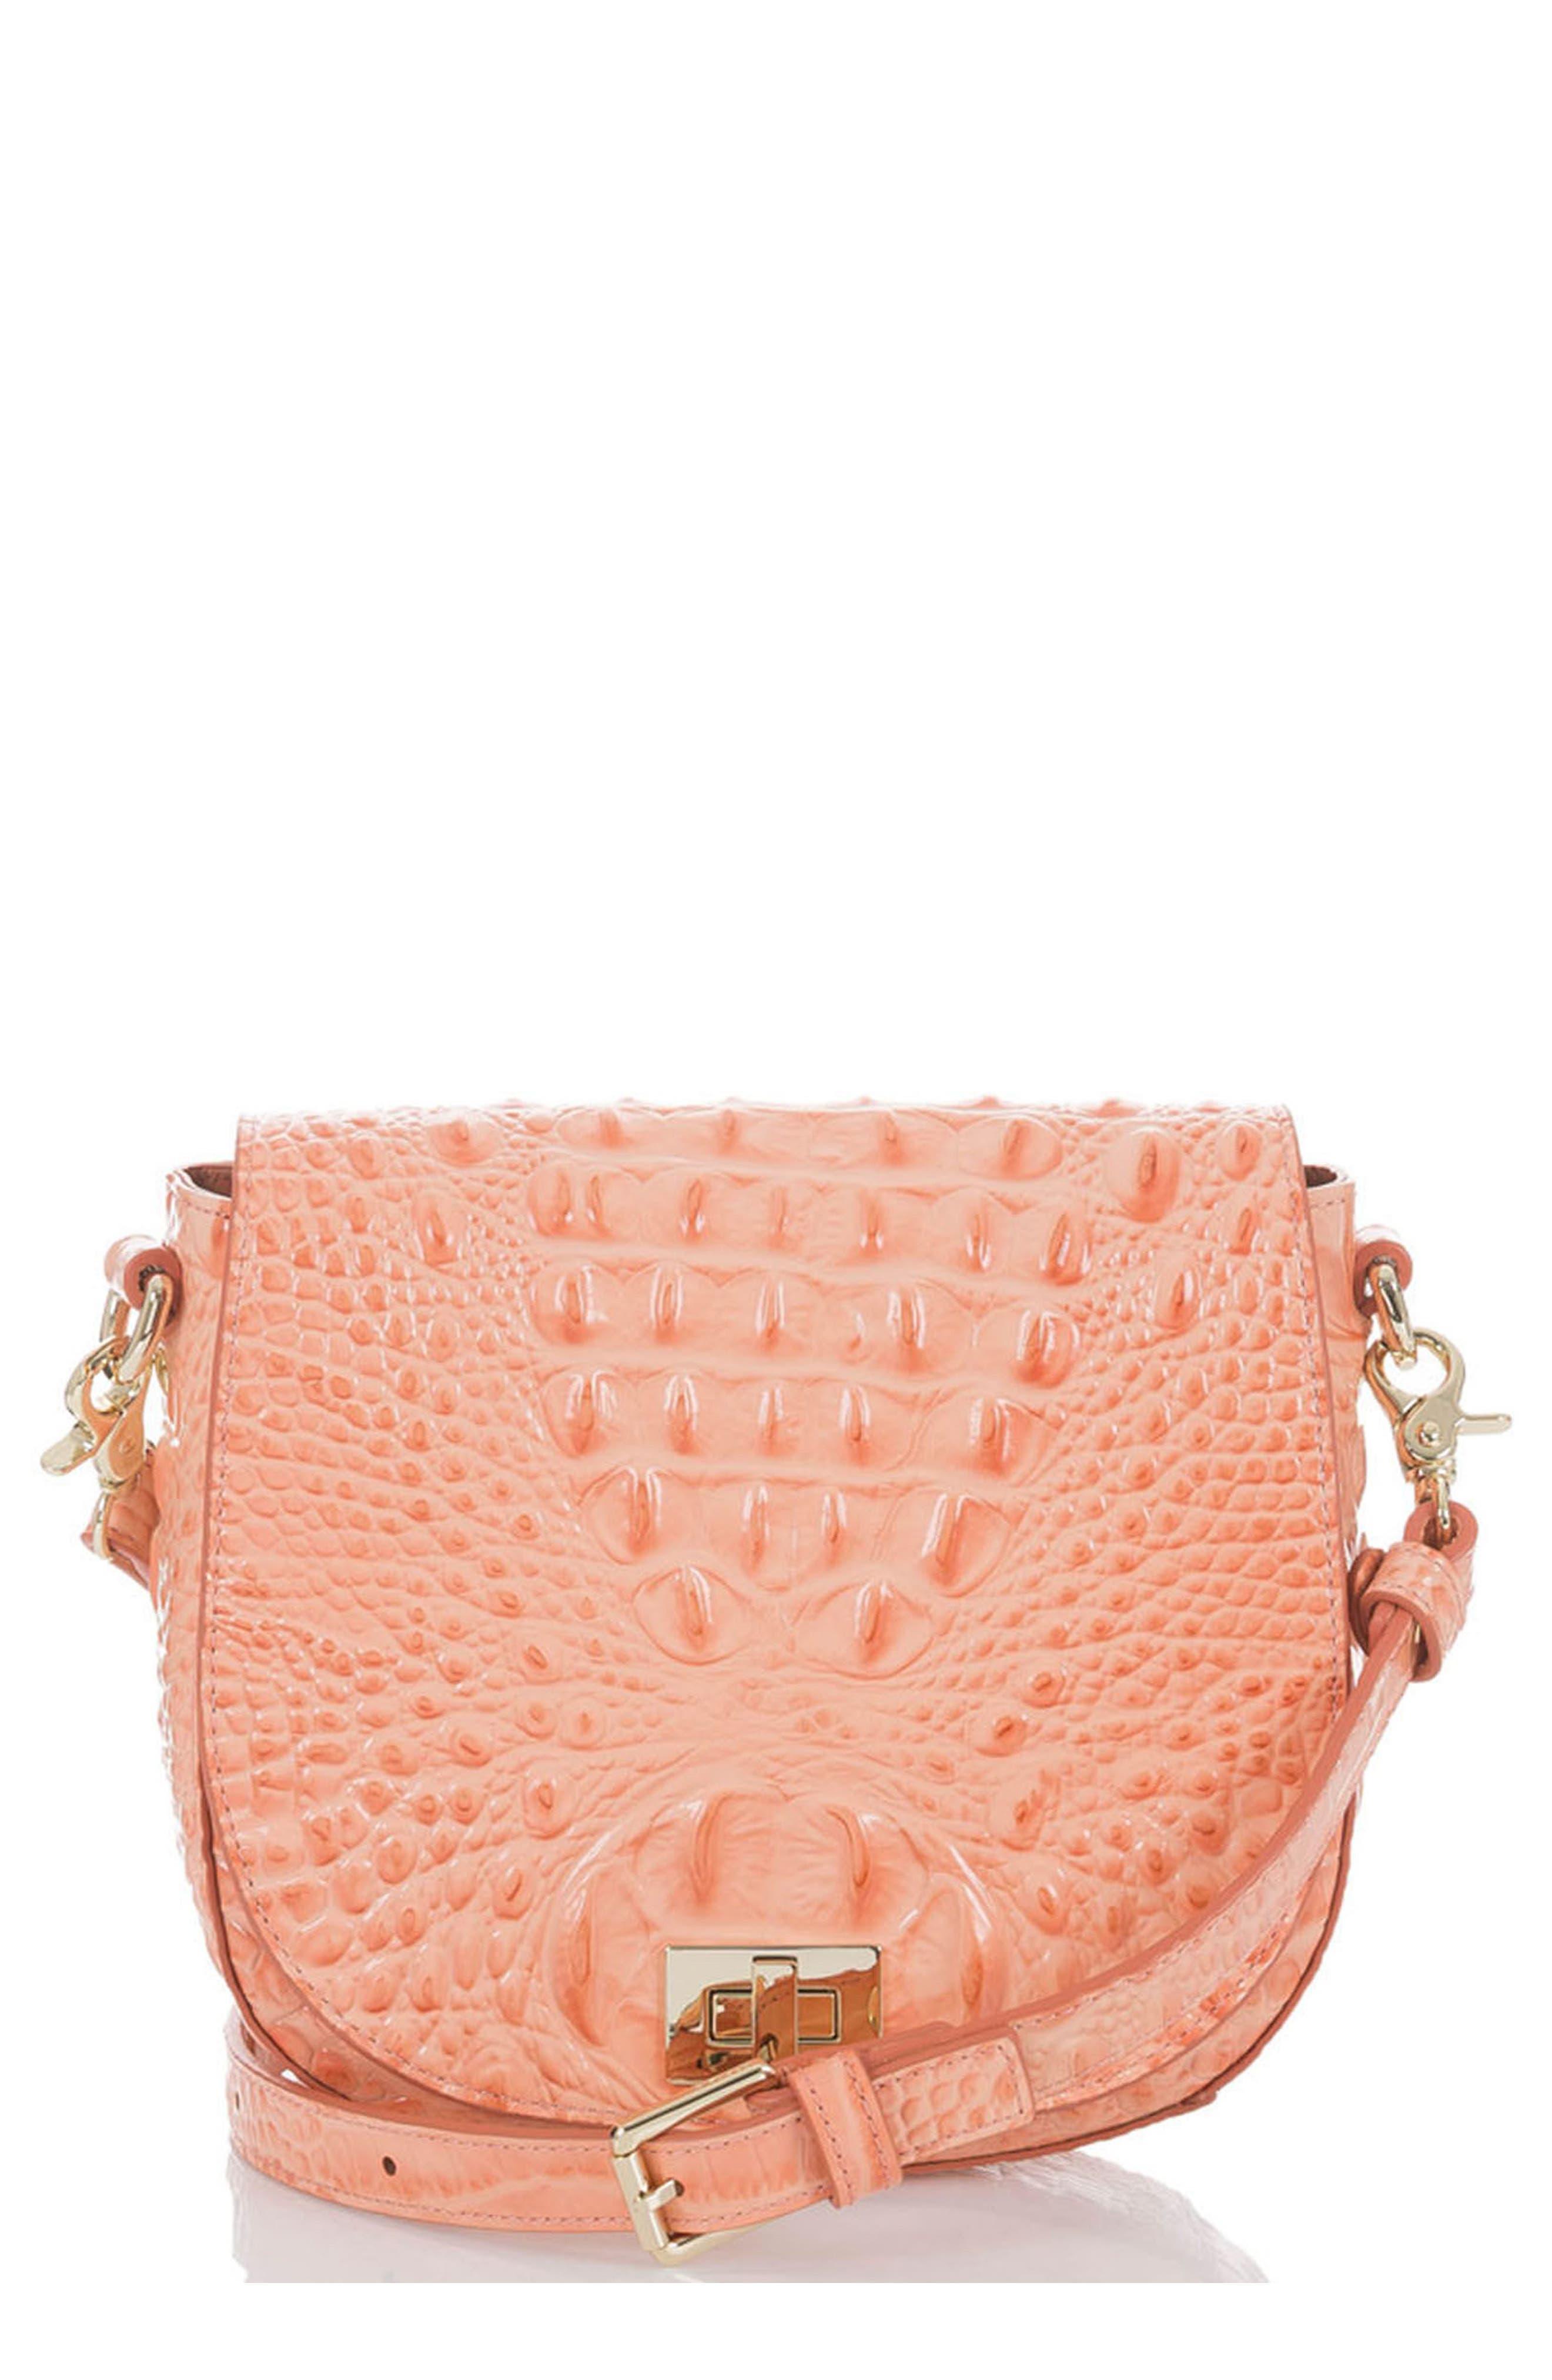 Mini Sonny Leather Crossbody Bag,                             Main thumbnail 1, color,                             CANTALOUPE